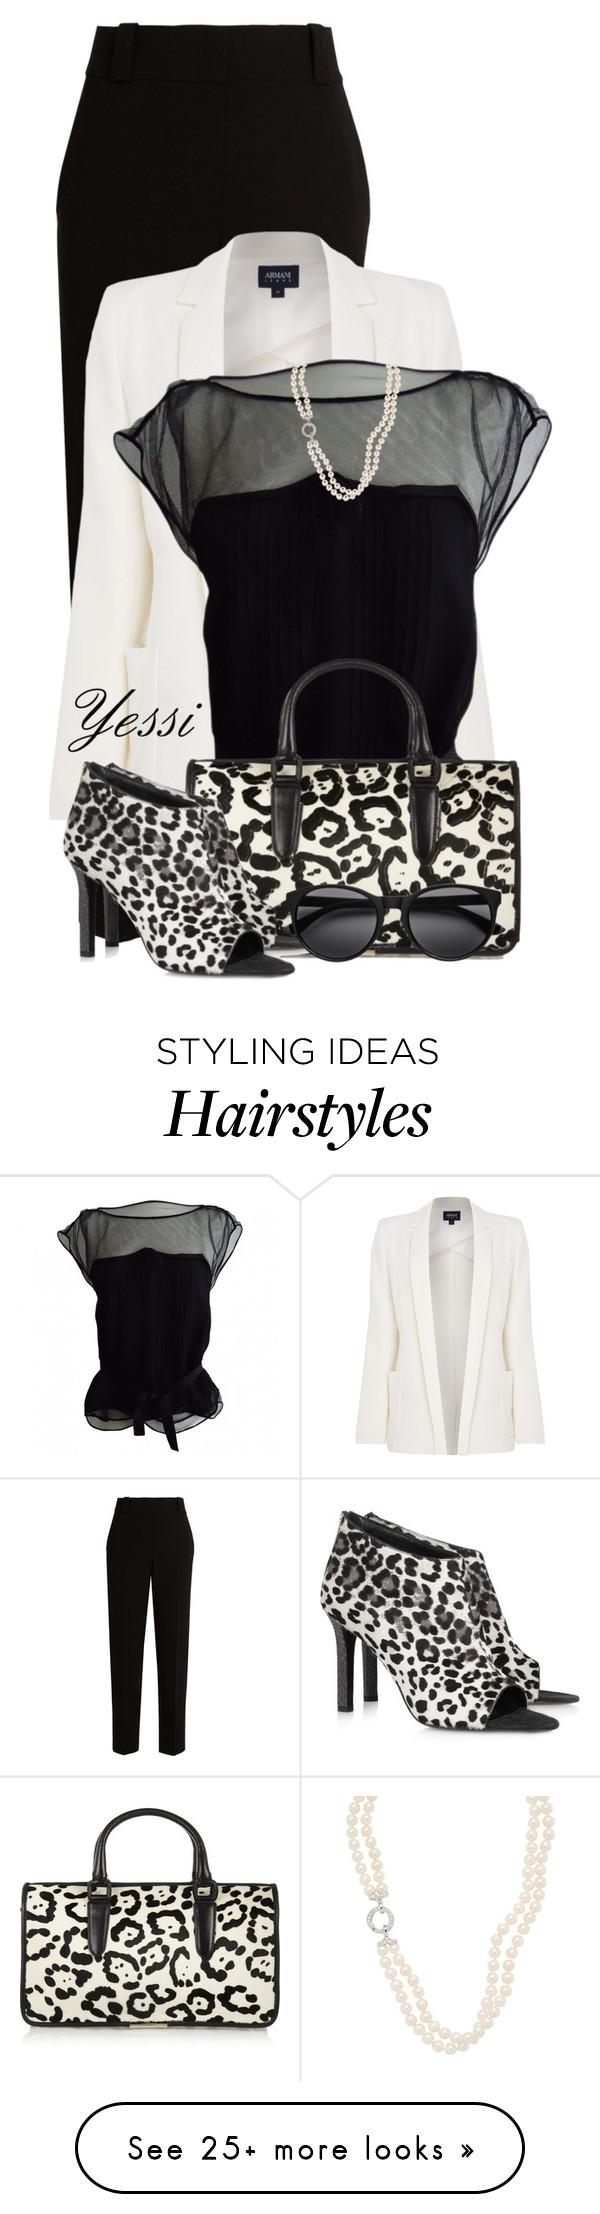 """~  Tamara Mellon Bag & Shoes  ~"" by pretty-fashion-designs on Polyvore featuring The Row, Armani Jeans, Louis Vuitton and Tamara Mellon"